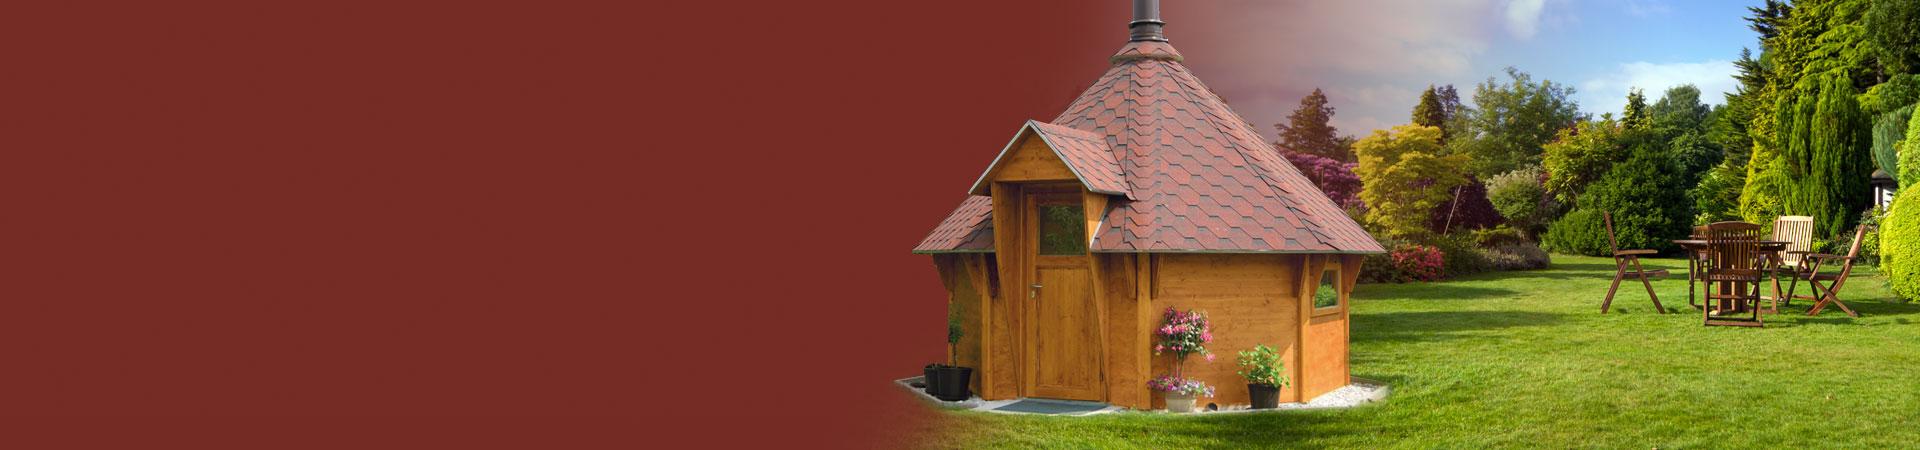 Grillkota und Holzbau